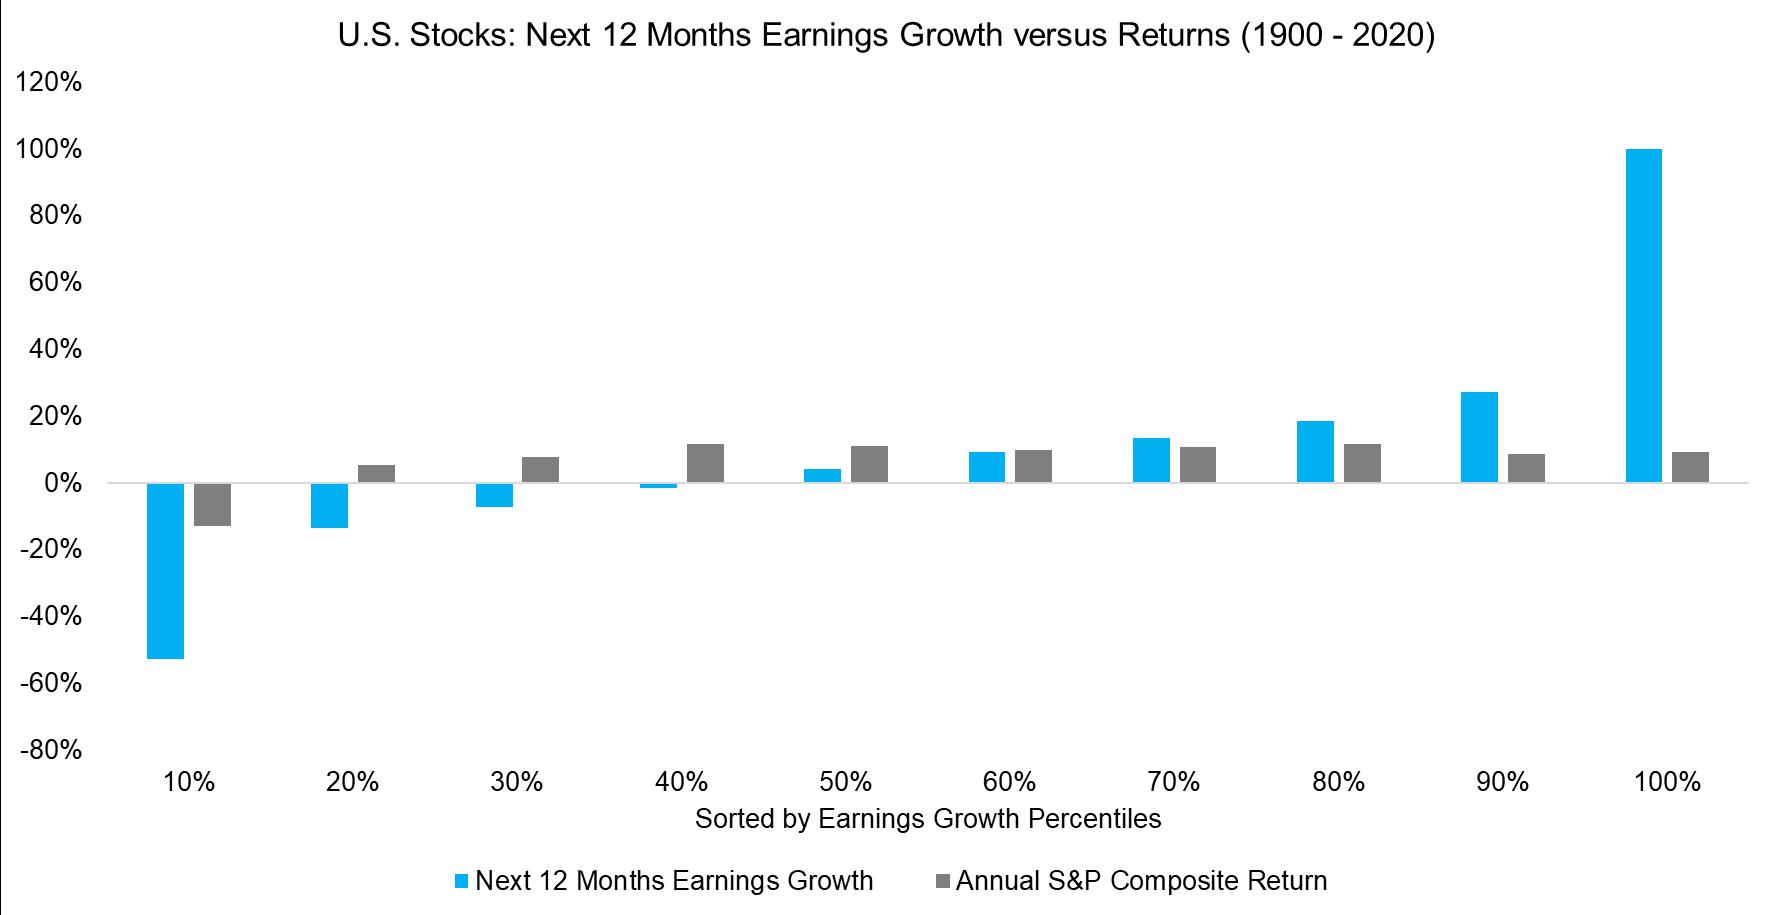 Next 12 Months Earnings Growth versus S&P 500 Returns (1900 - 2020)